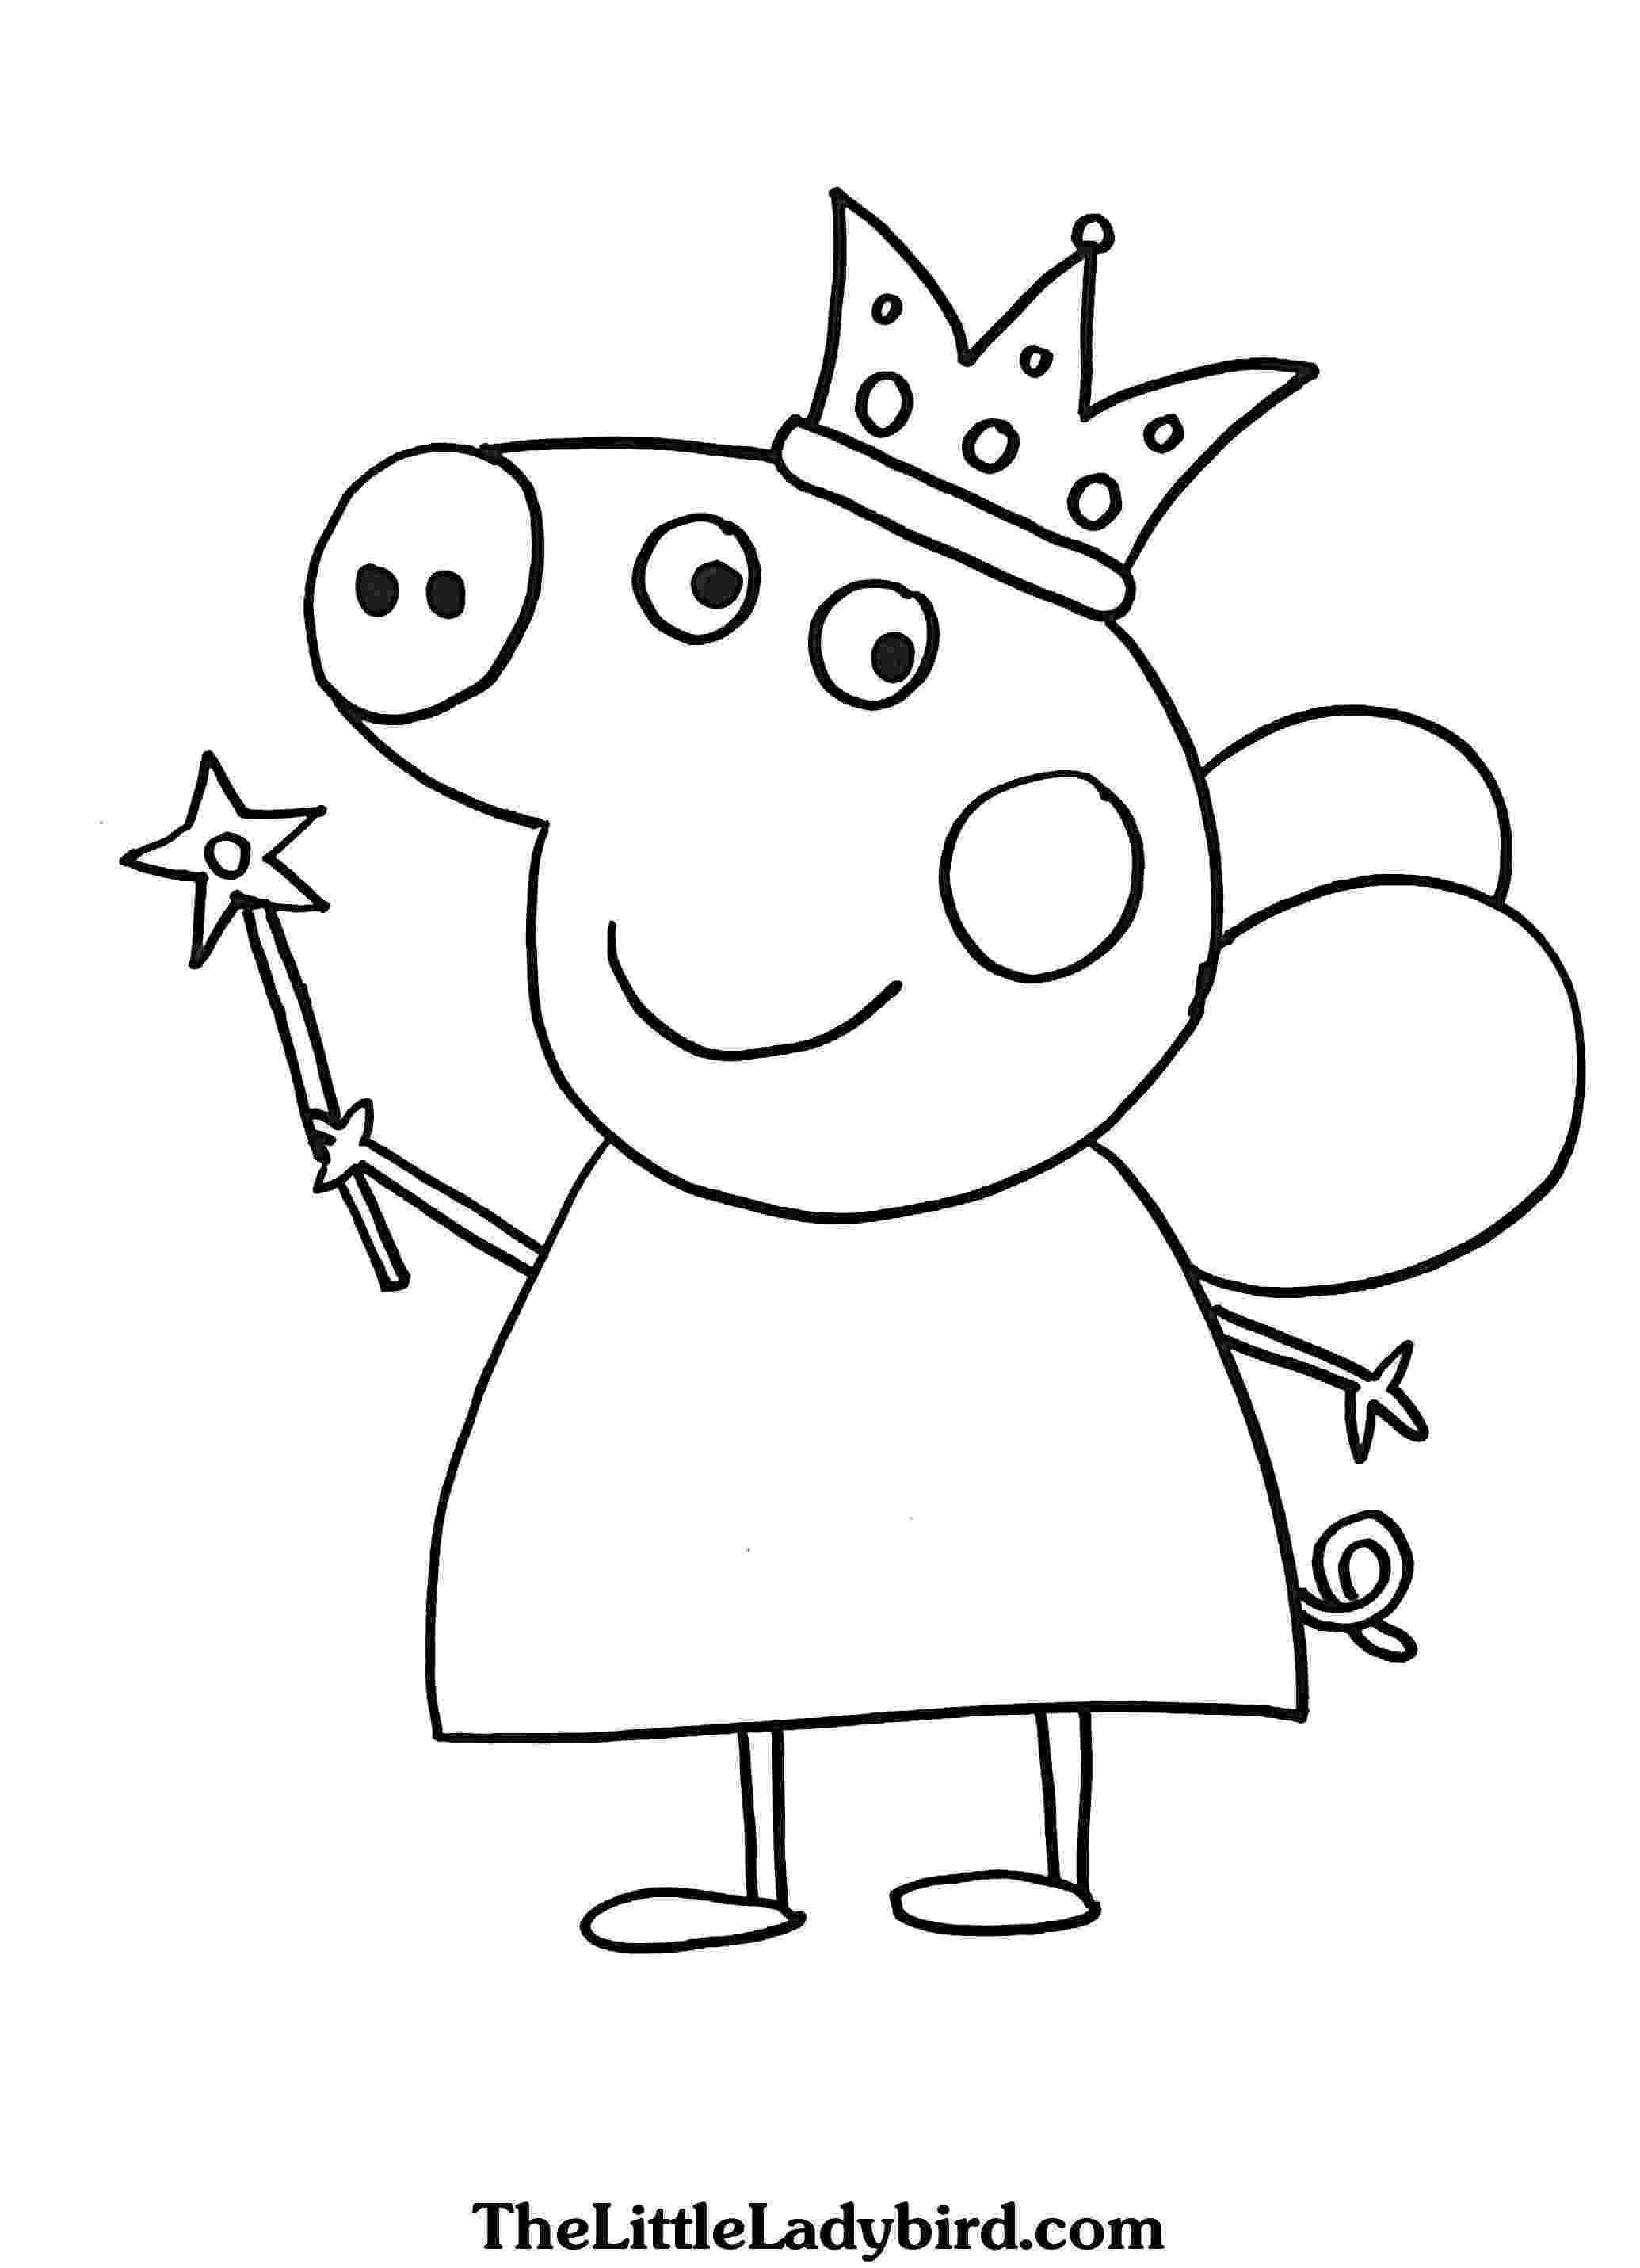 coloring book peppa pig peppa pig coloring pages getcoloringpagescom book peppa pig coloring